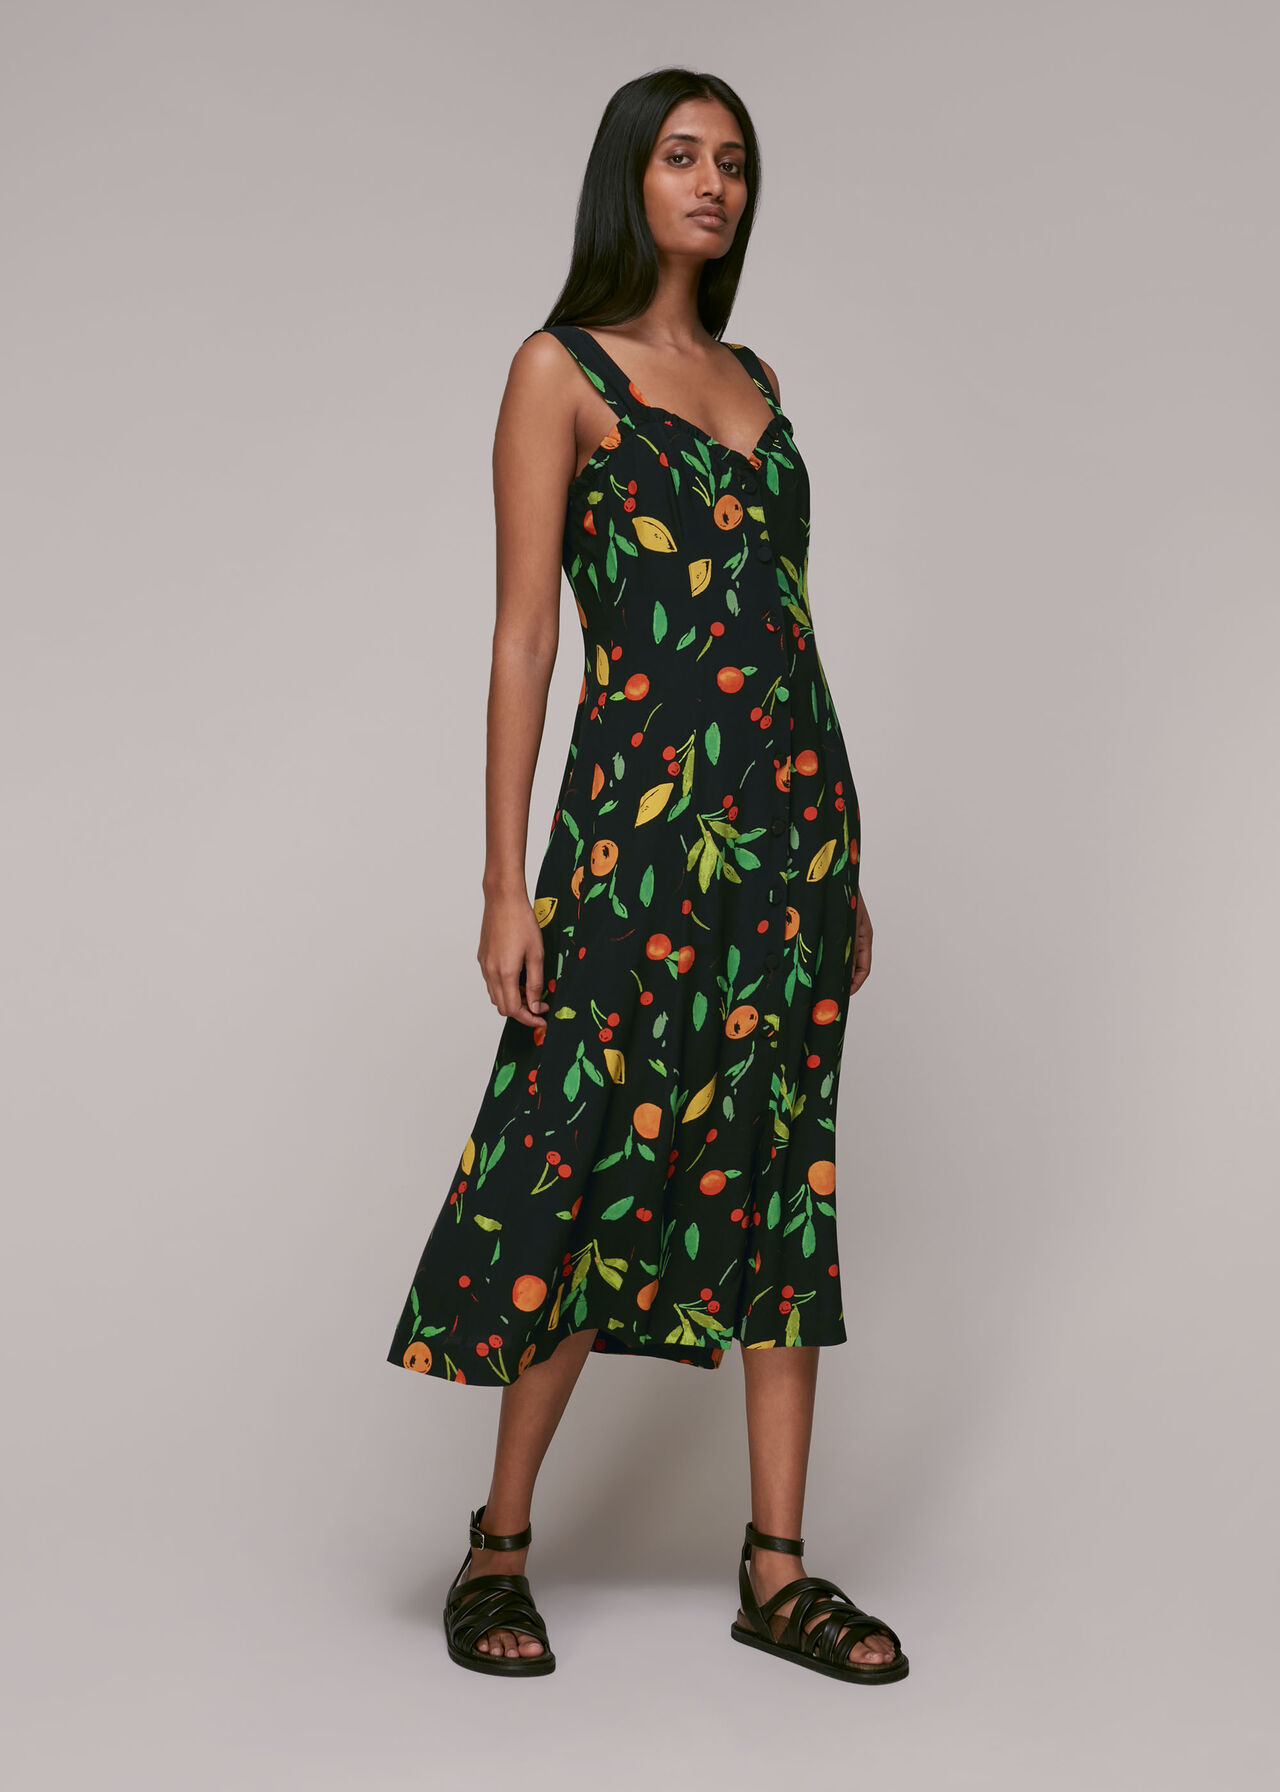 Fruit Print Frill Dress